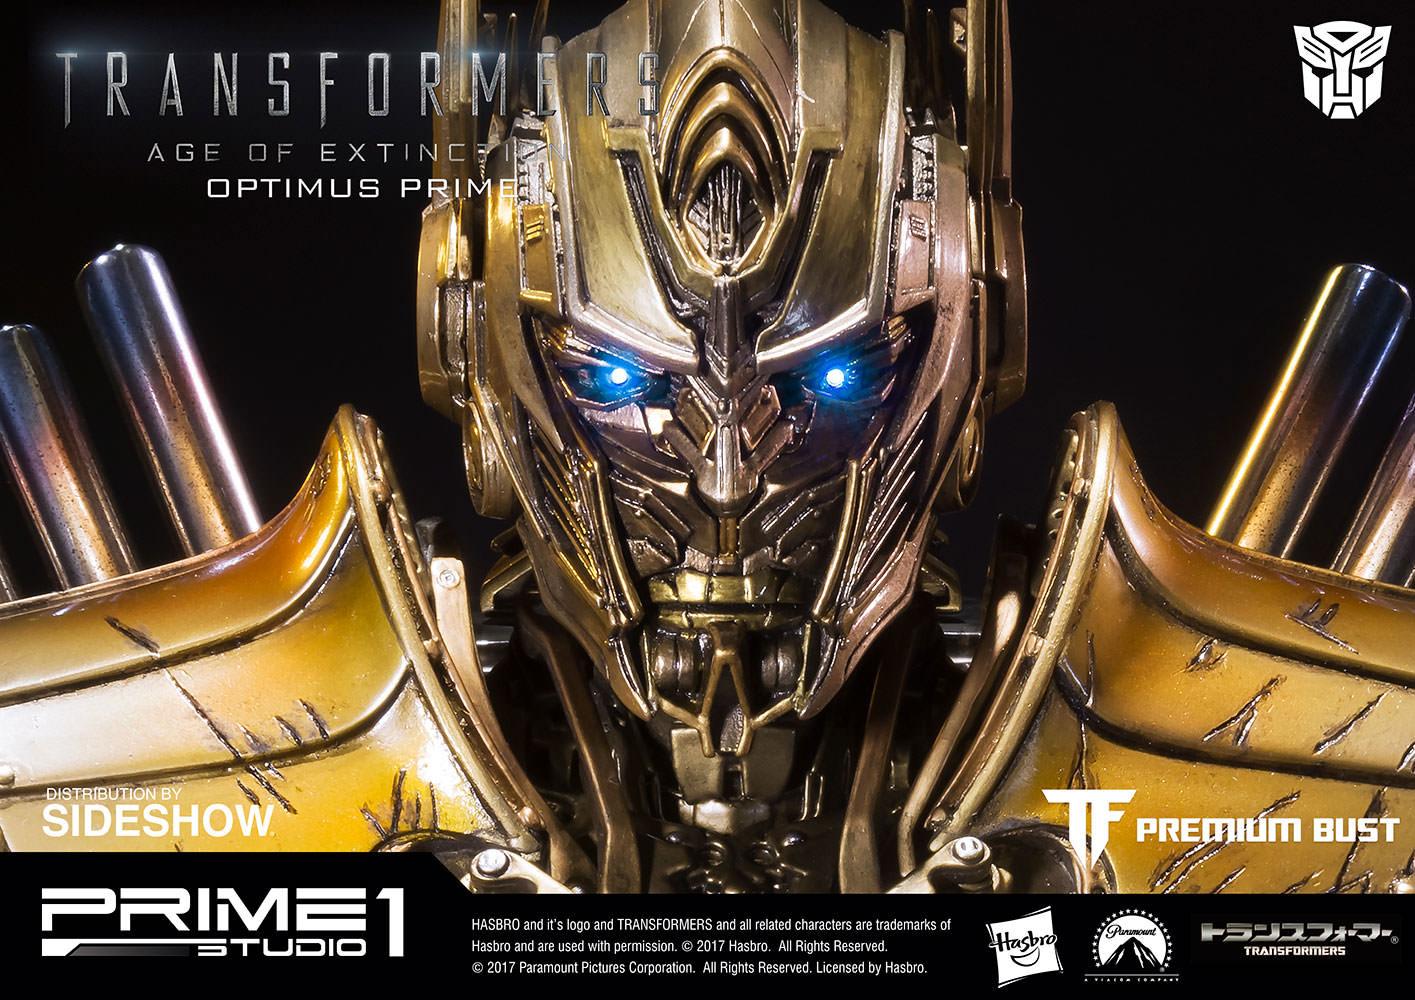 transformers optimus prime gold bustprime 1 studio